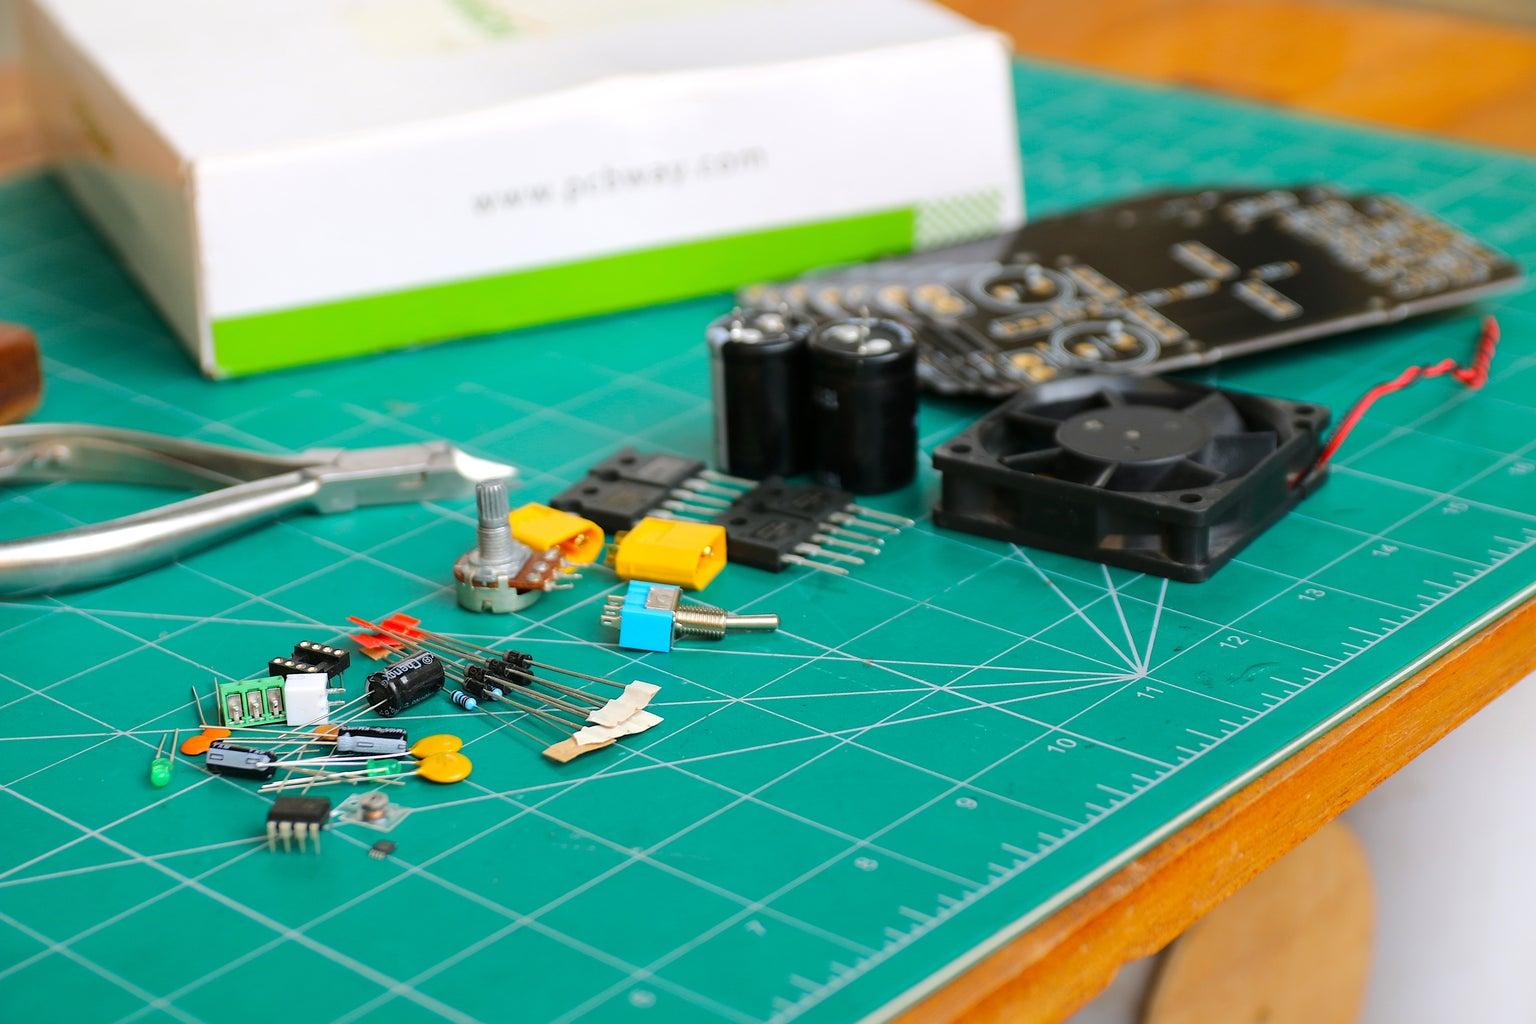 Tools Materials and Skills